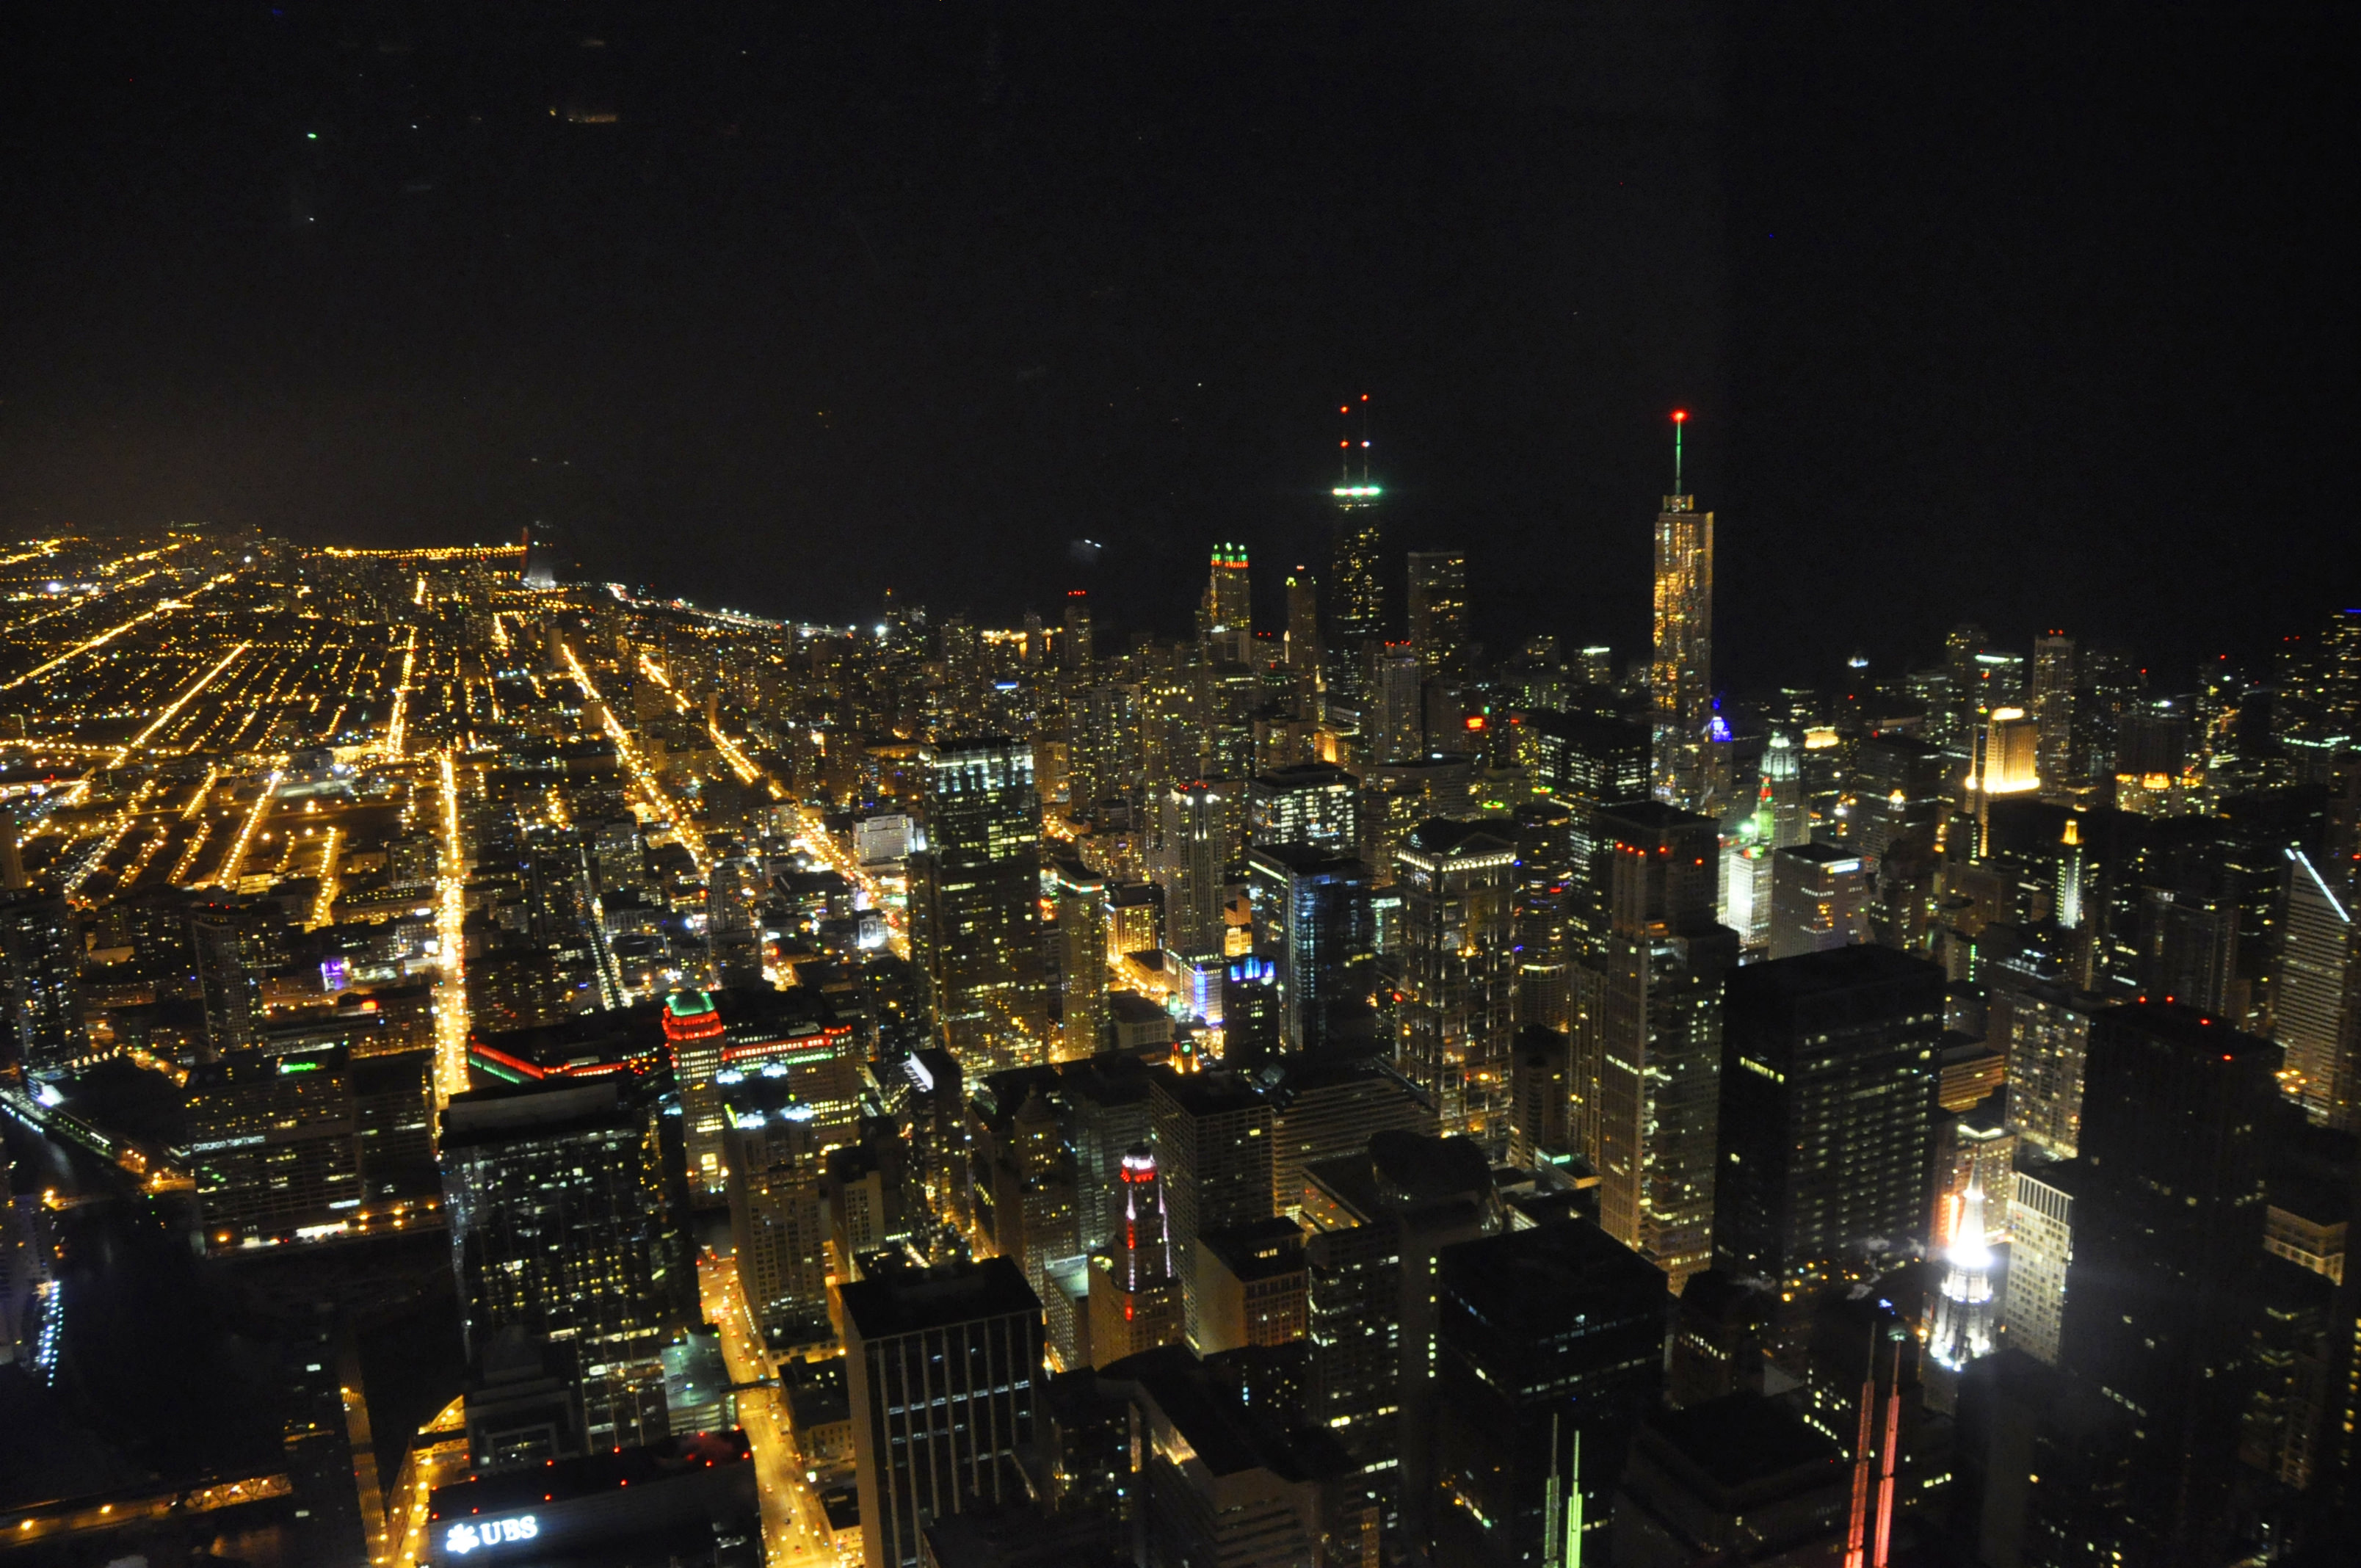 Willis Tower 東かかの俯瞰撮影 2013